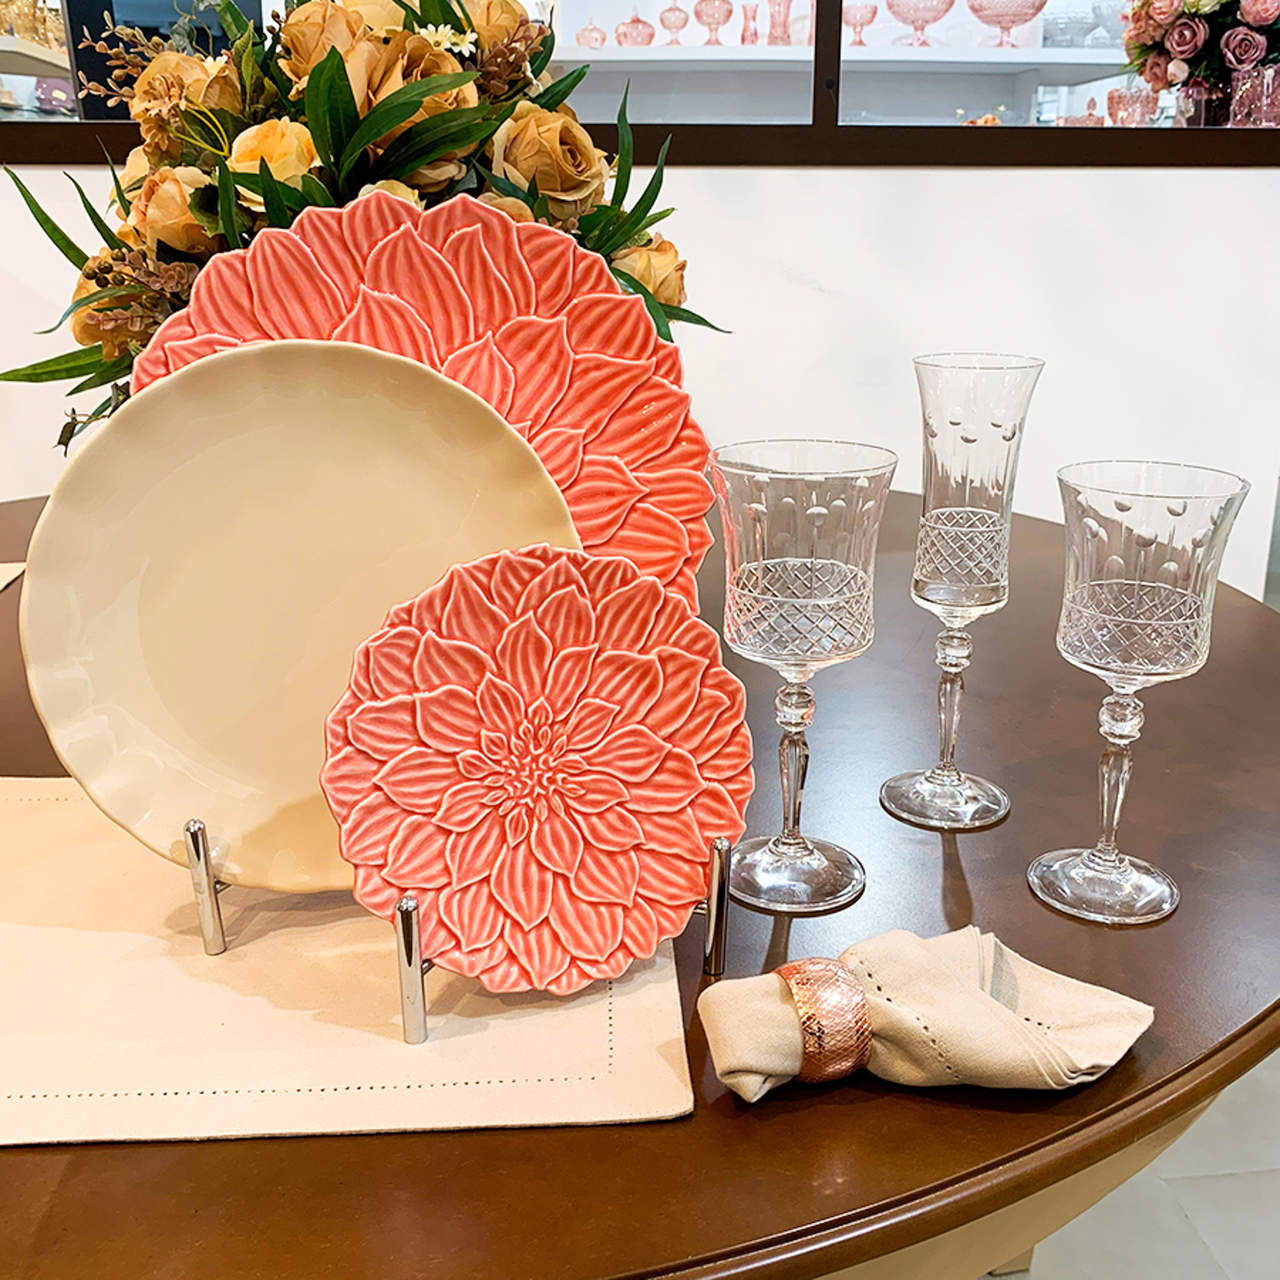 Prato de sobremesa 19 cm de porcelana coral Daisy Wolff - 27745